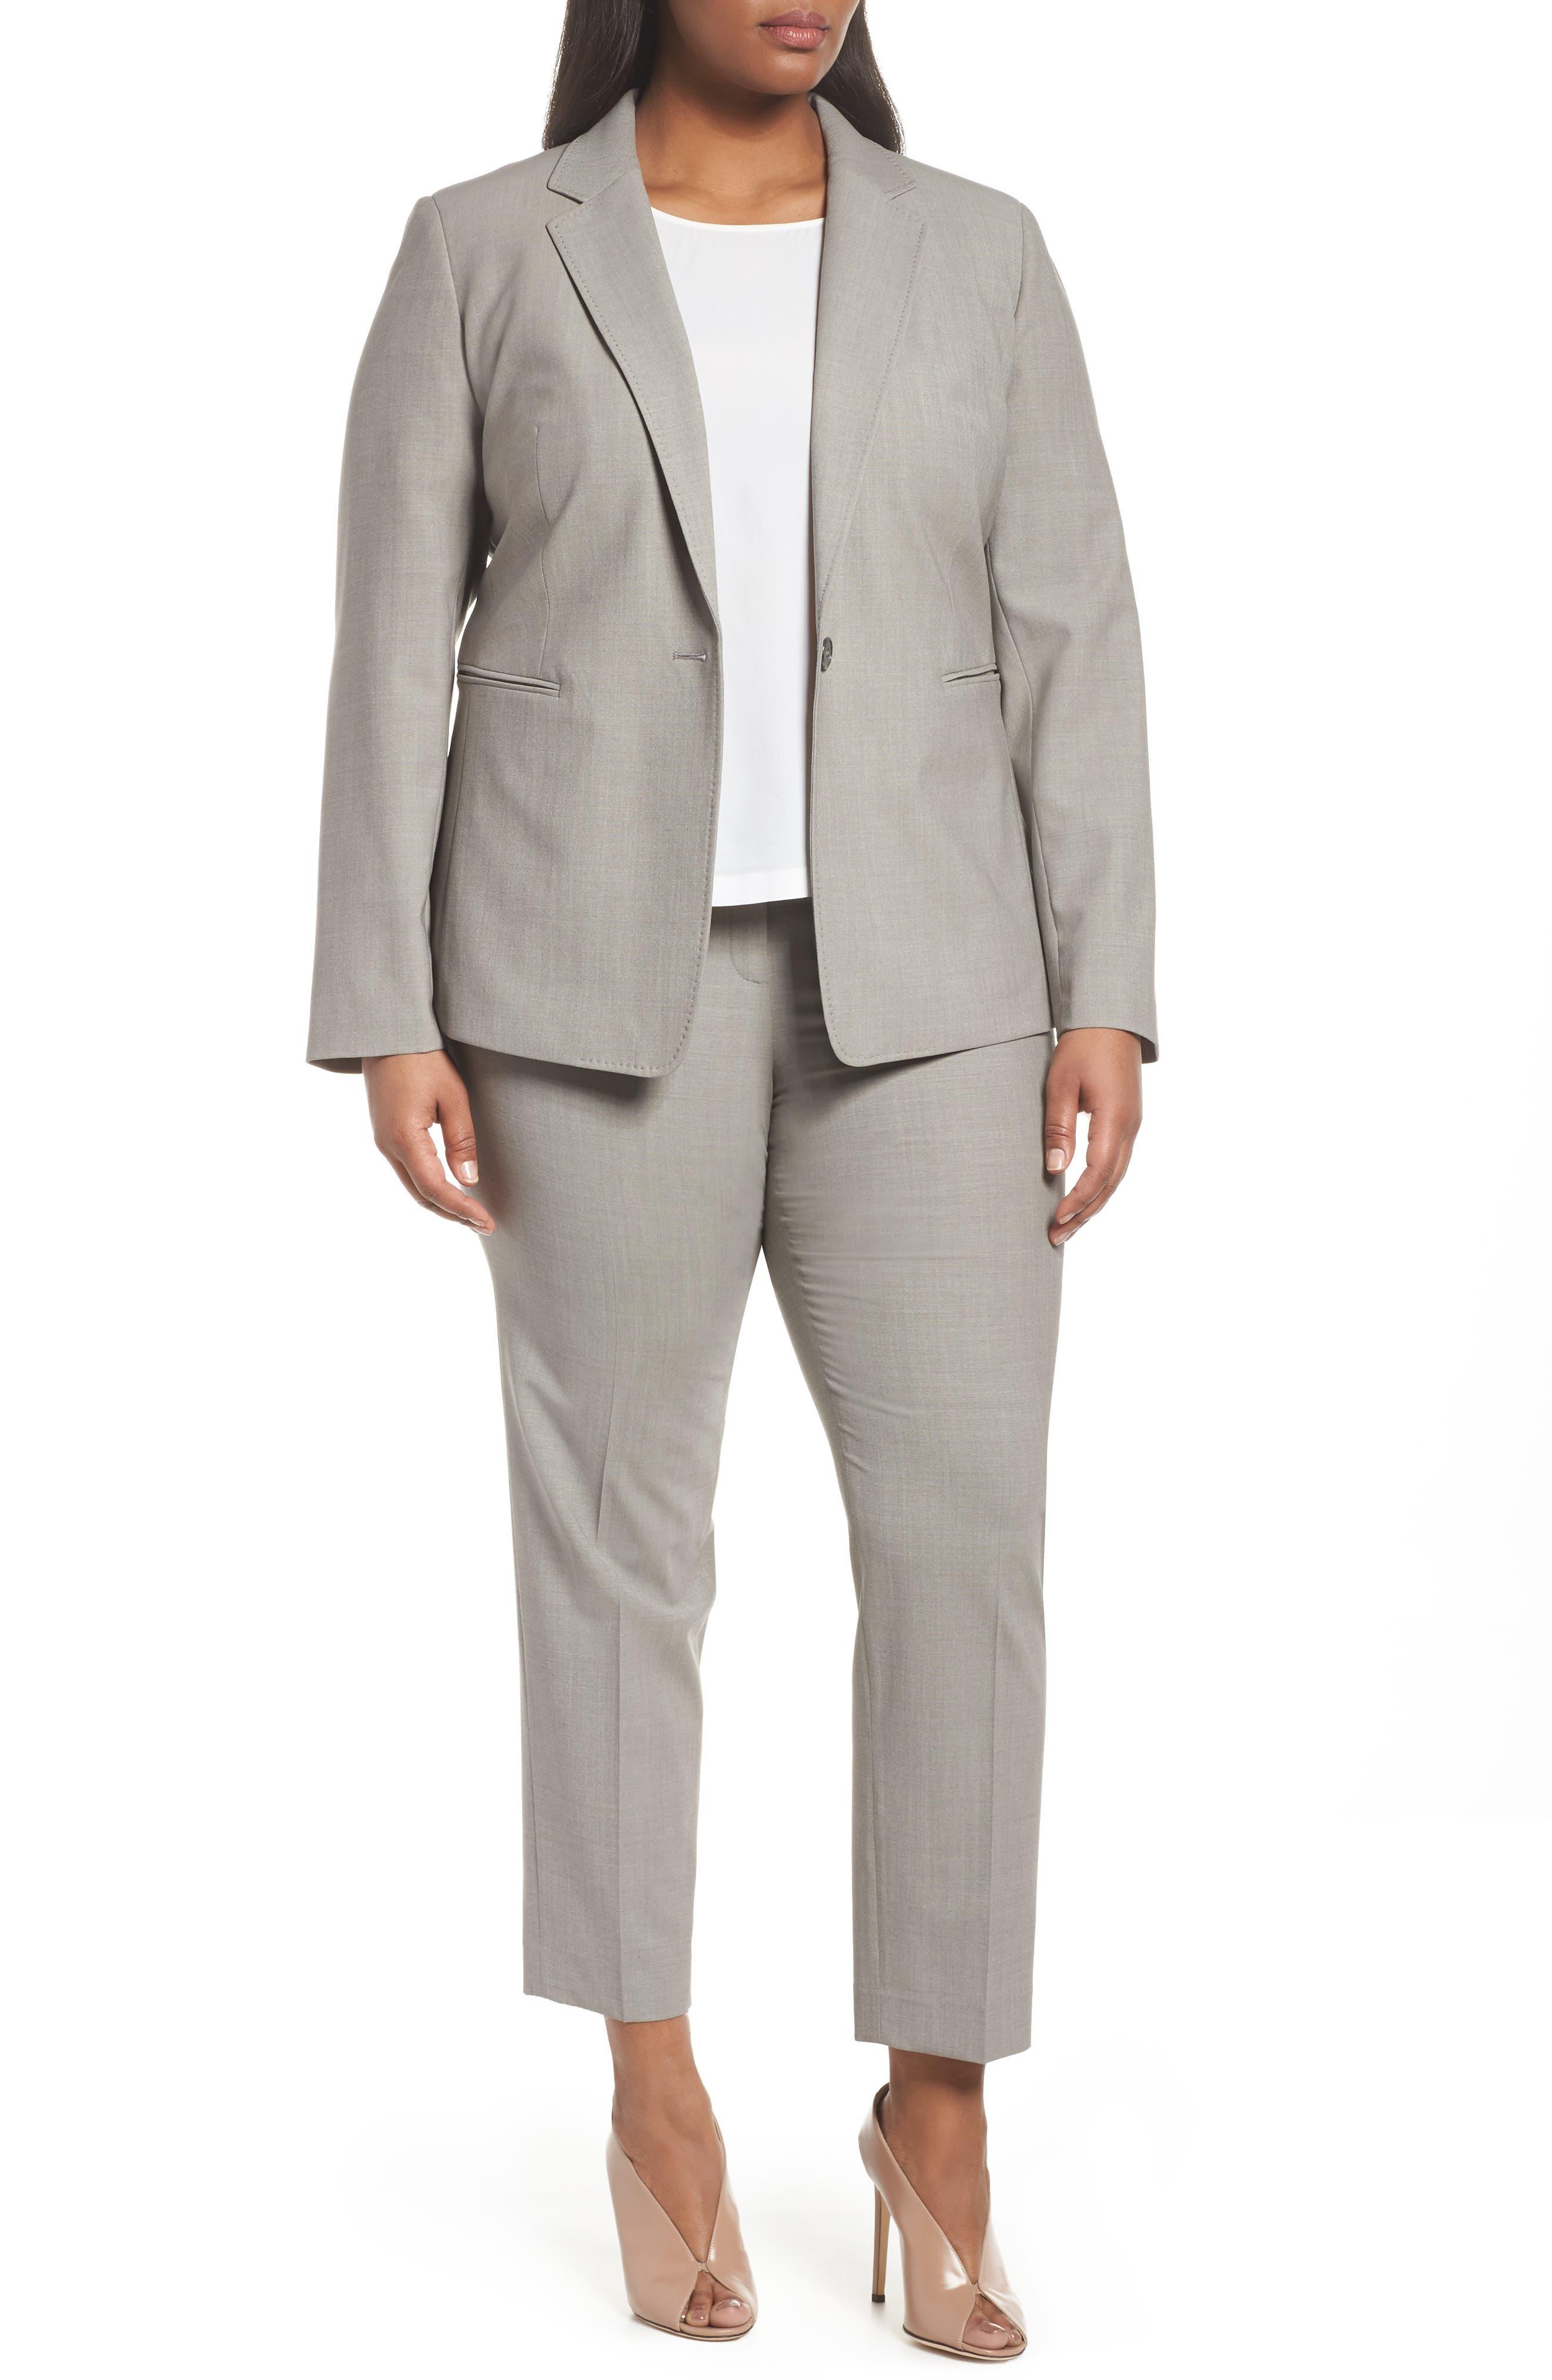 Bleecker Stretch Wool Suit Pants,                             Alternate thumbnail 7, color,                             Feather Grey Melange